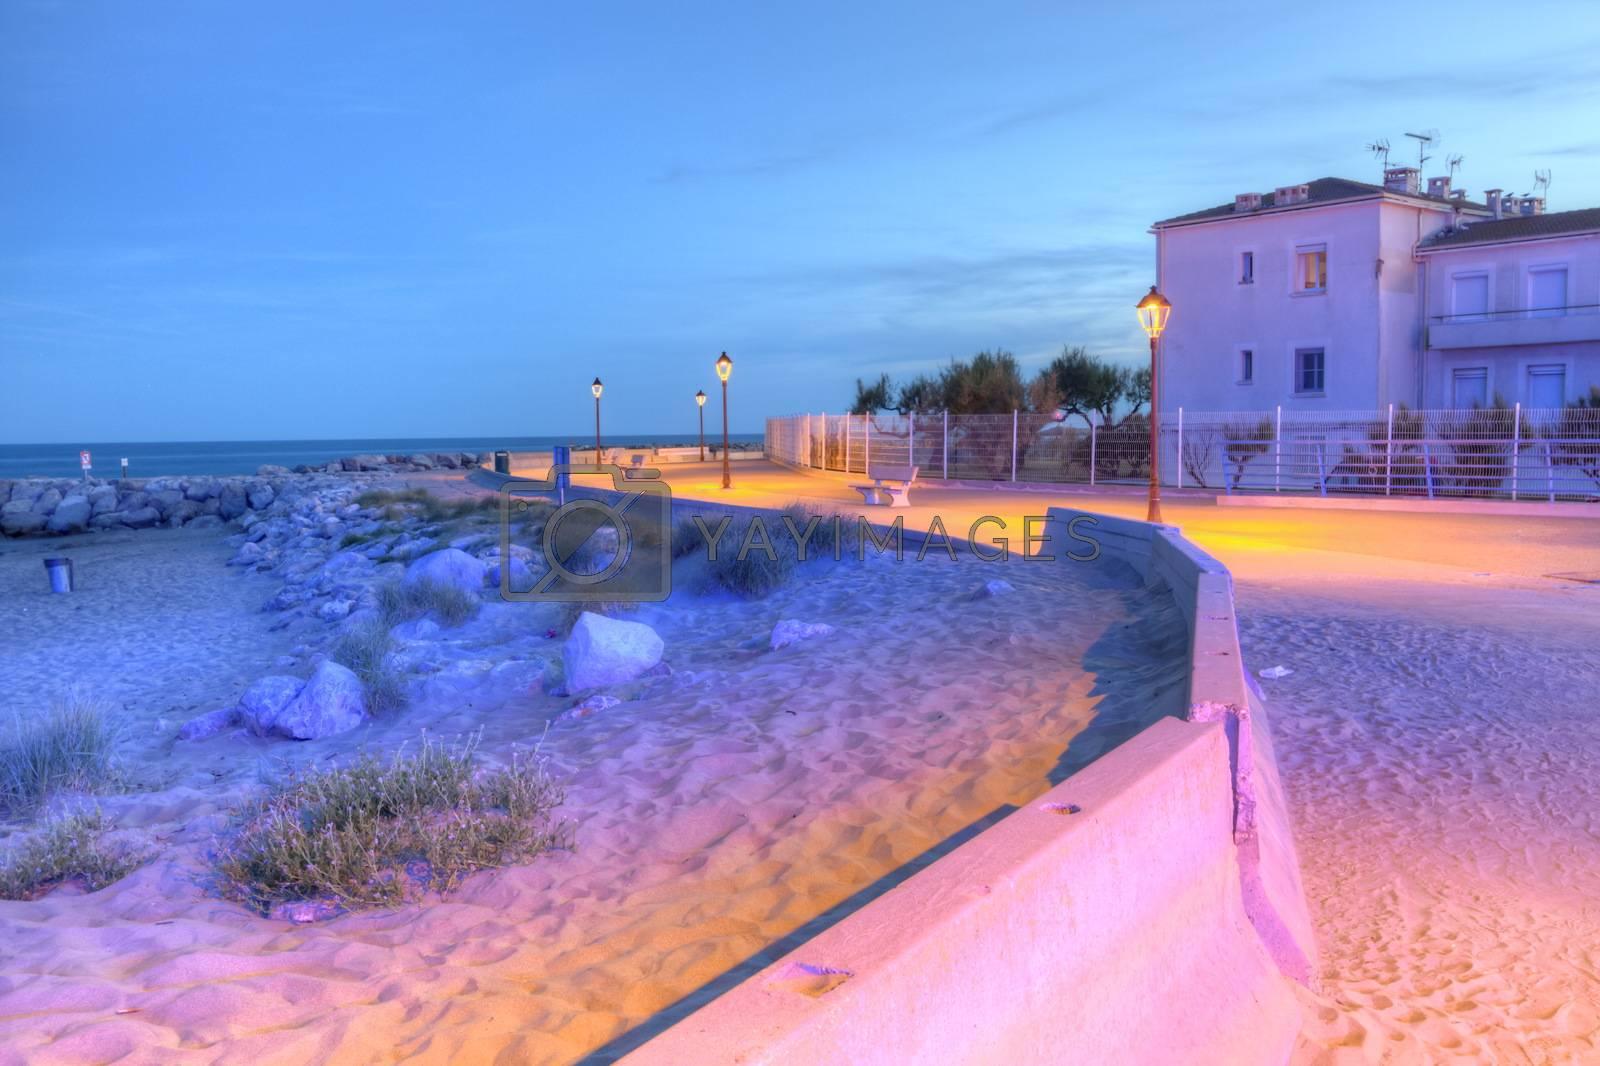 Promenade near mediterranean sea by night, Saintes-Maries-de-la-mer, Camargue, France, HDR